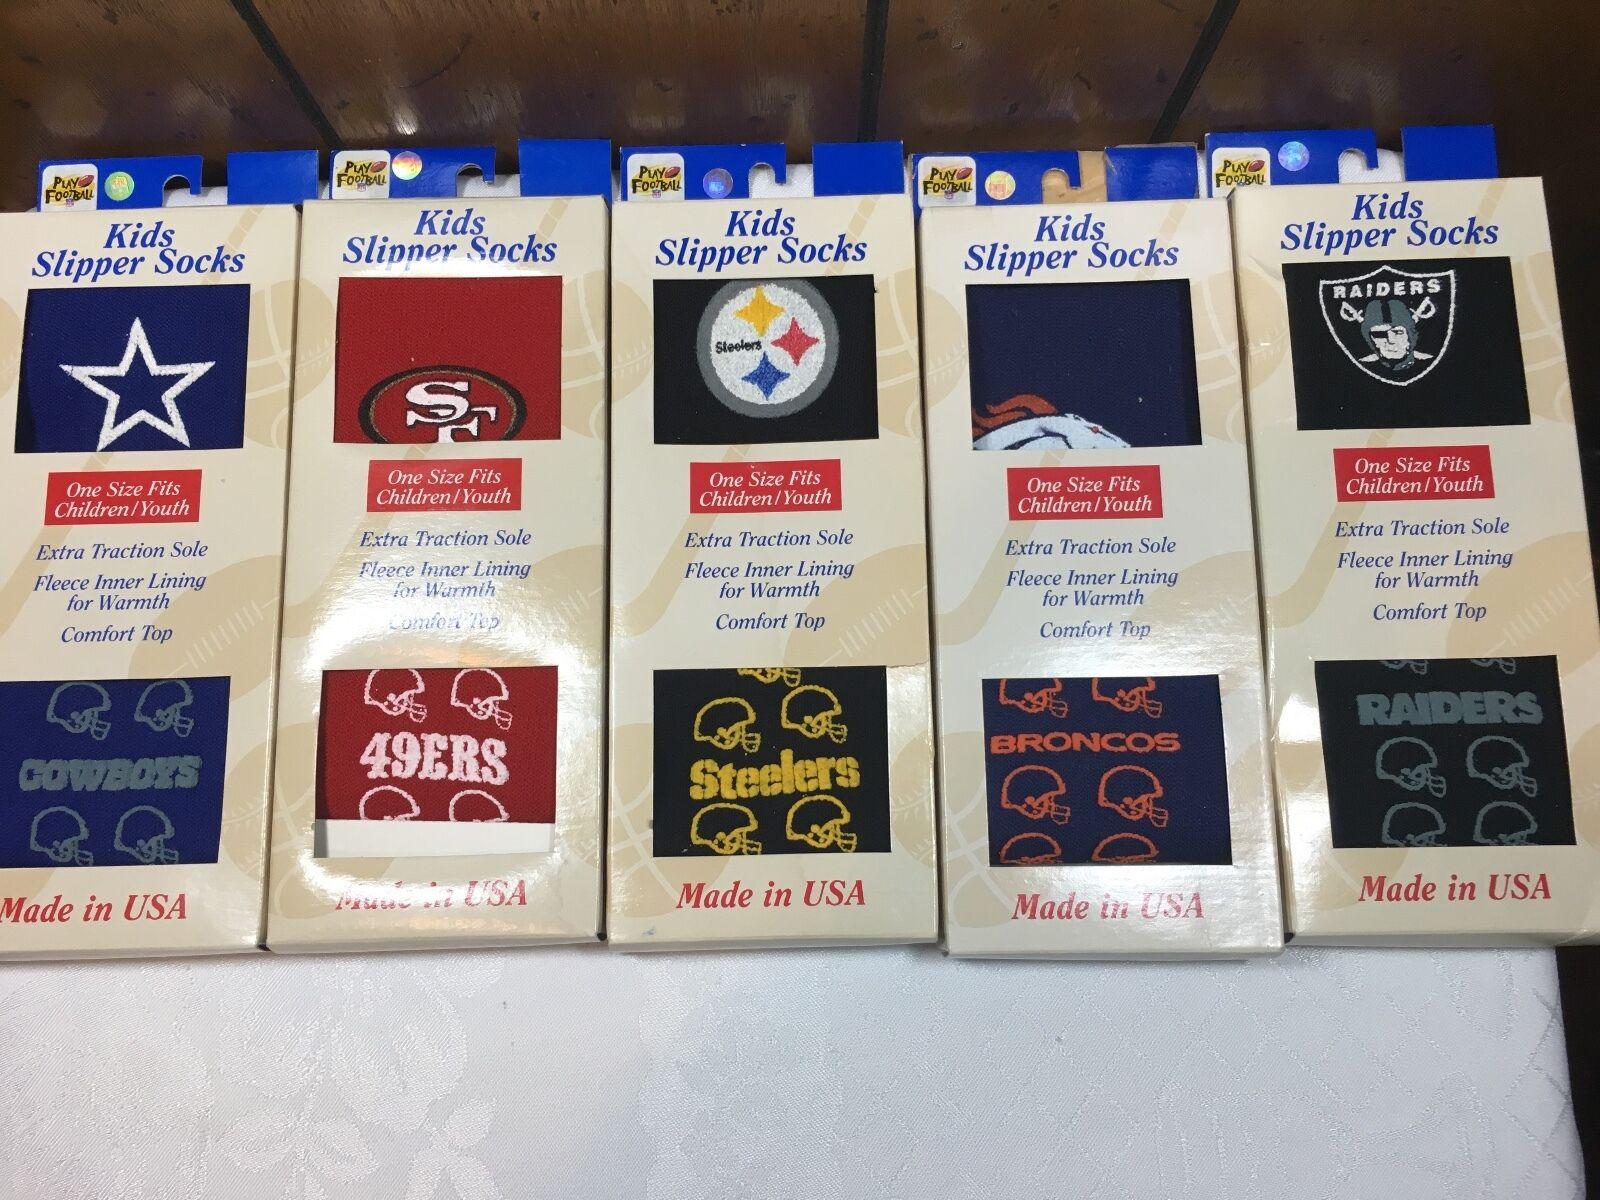 LAS VEGAS RAIDERS LICENSED NFL KIDS SLIPPER SOCKS UNISEX ONE SIZE FITS ALL Fan Apparel & Souvenirs